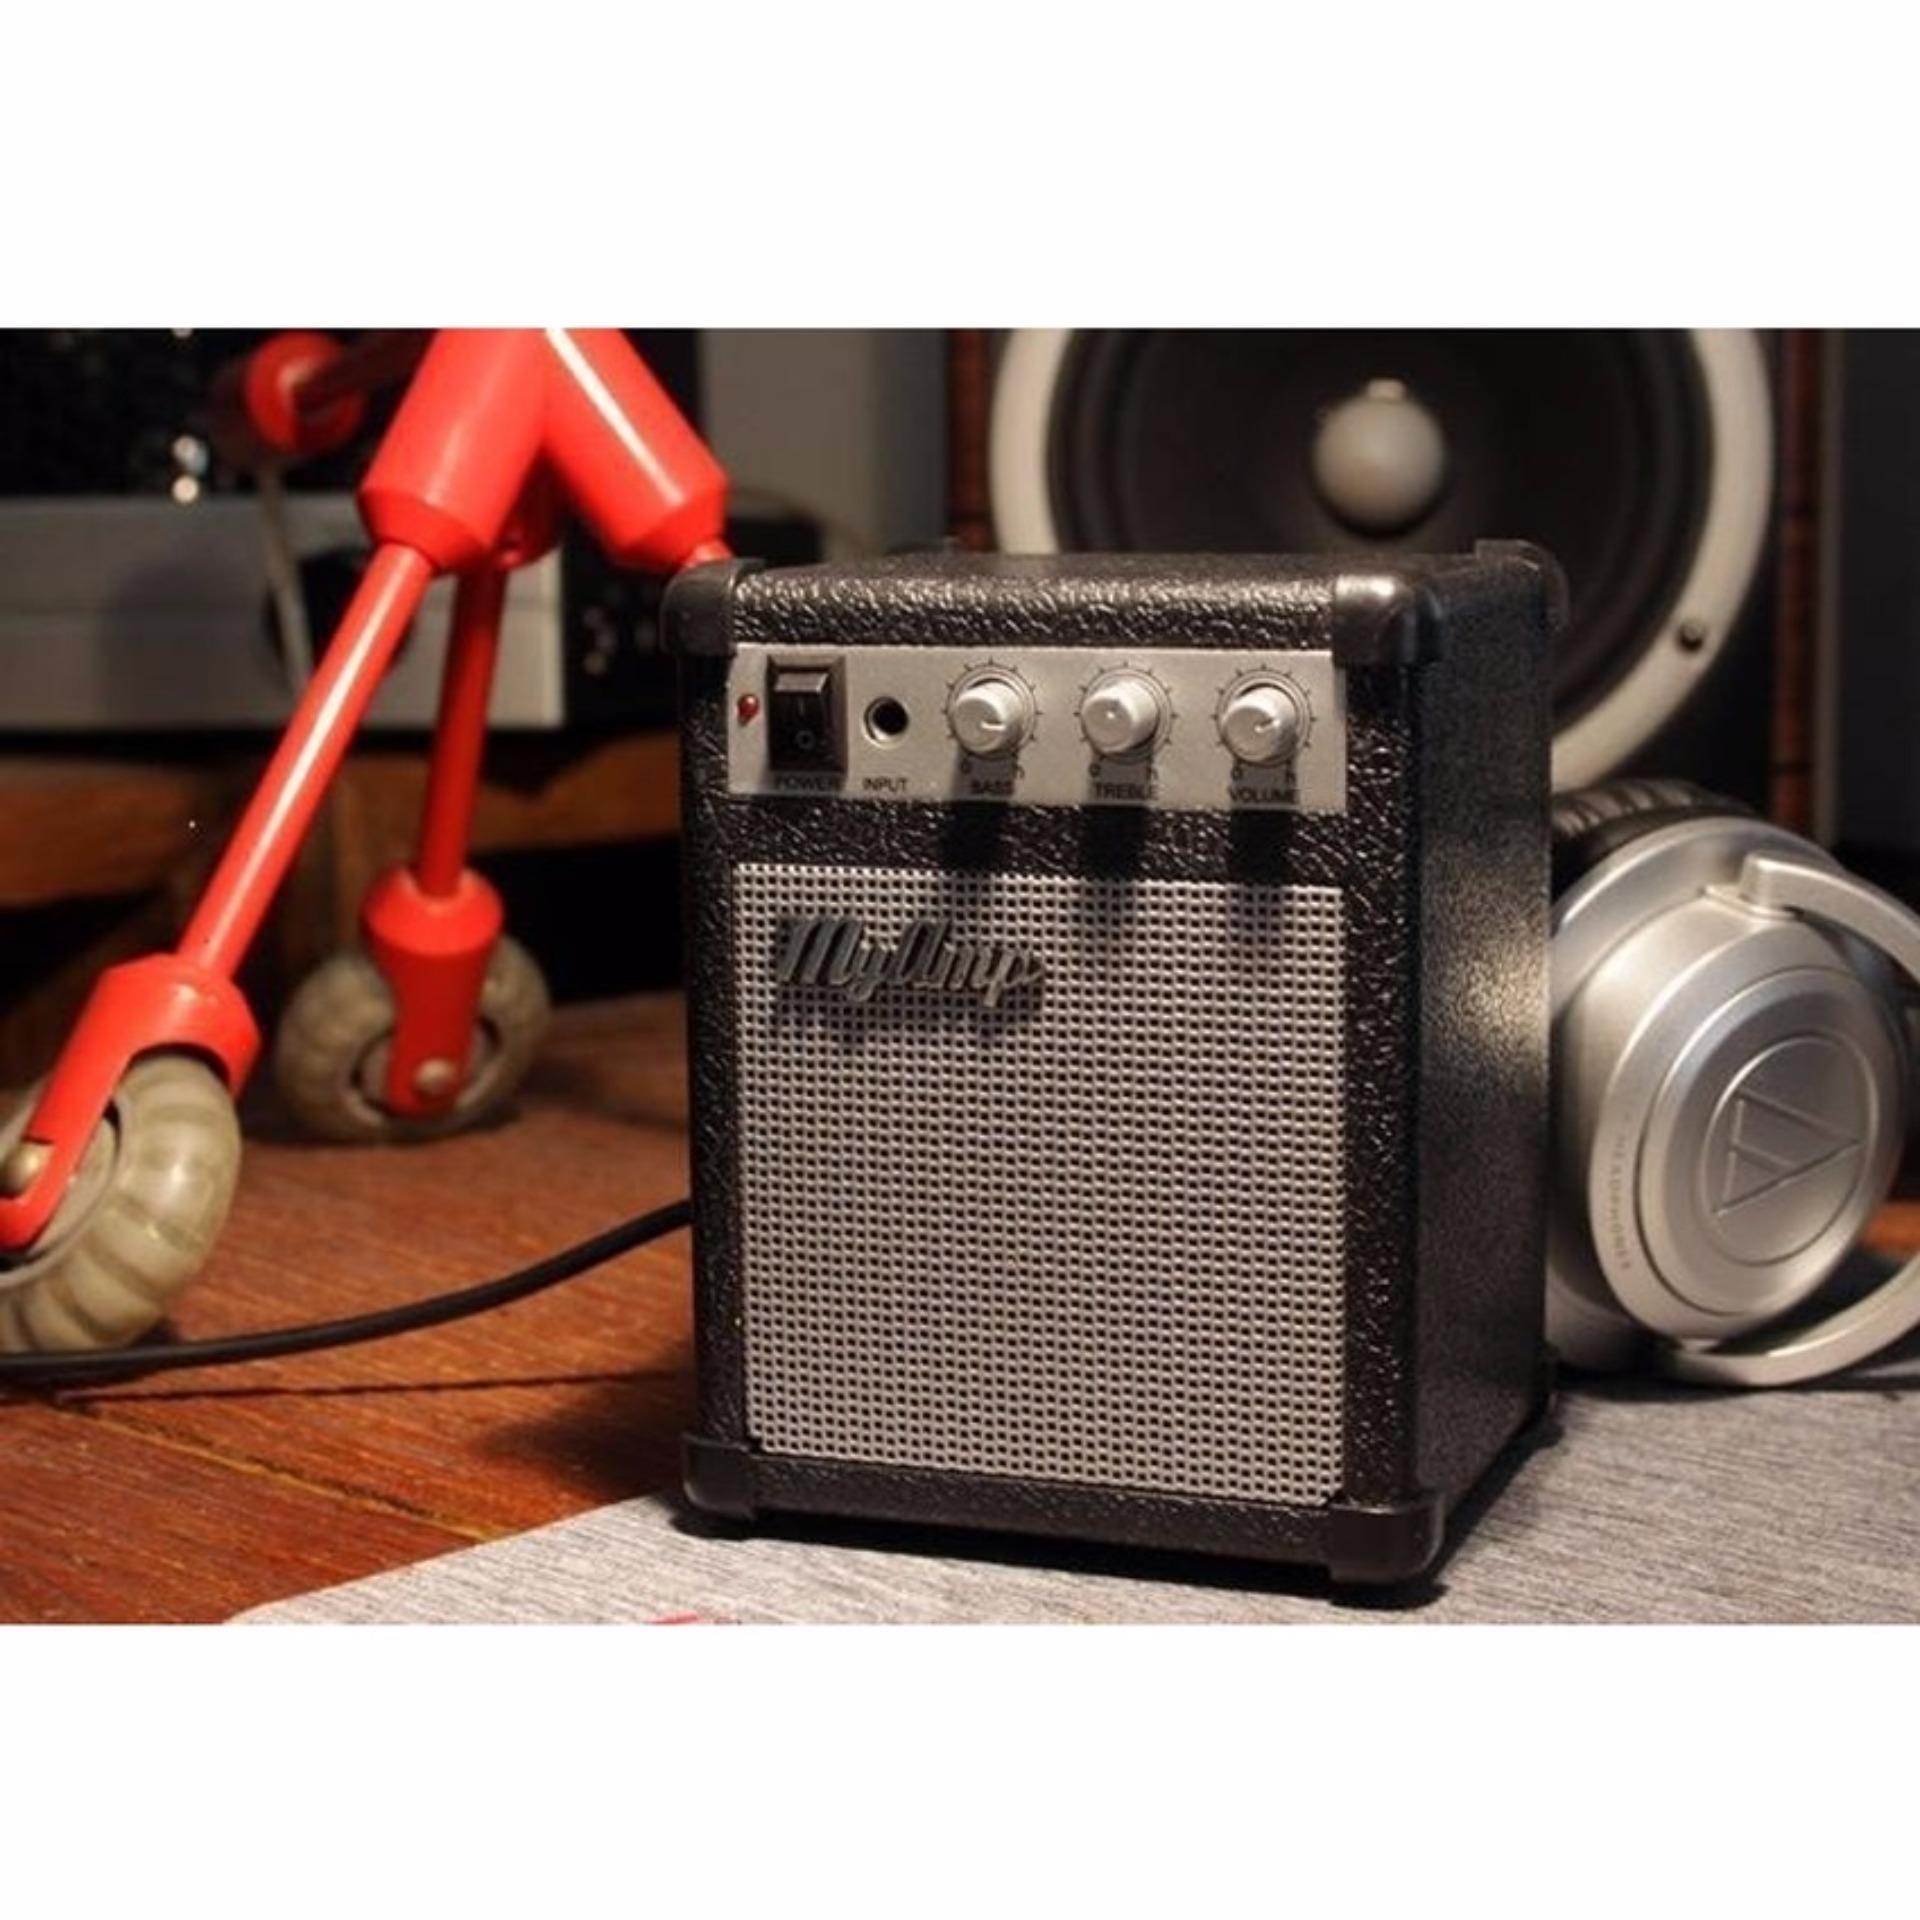 Teiton Portable Speaker MyAmp Classic Amplifier Music Guitar MP3 Player iPod iPhone Ponsel Handphone Laptop Aksesoris